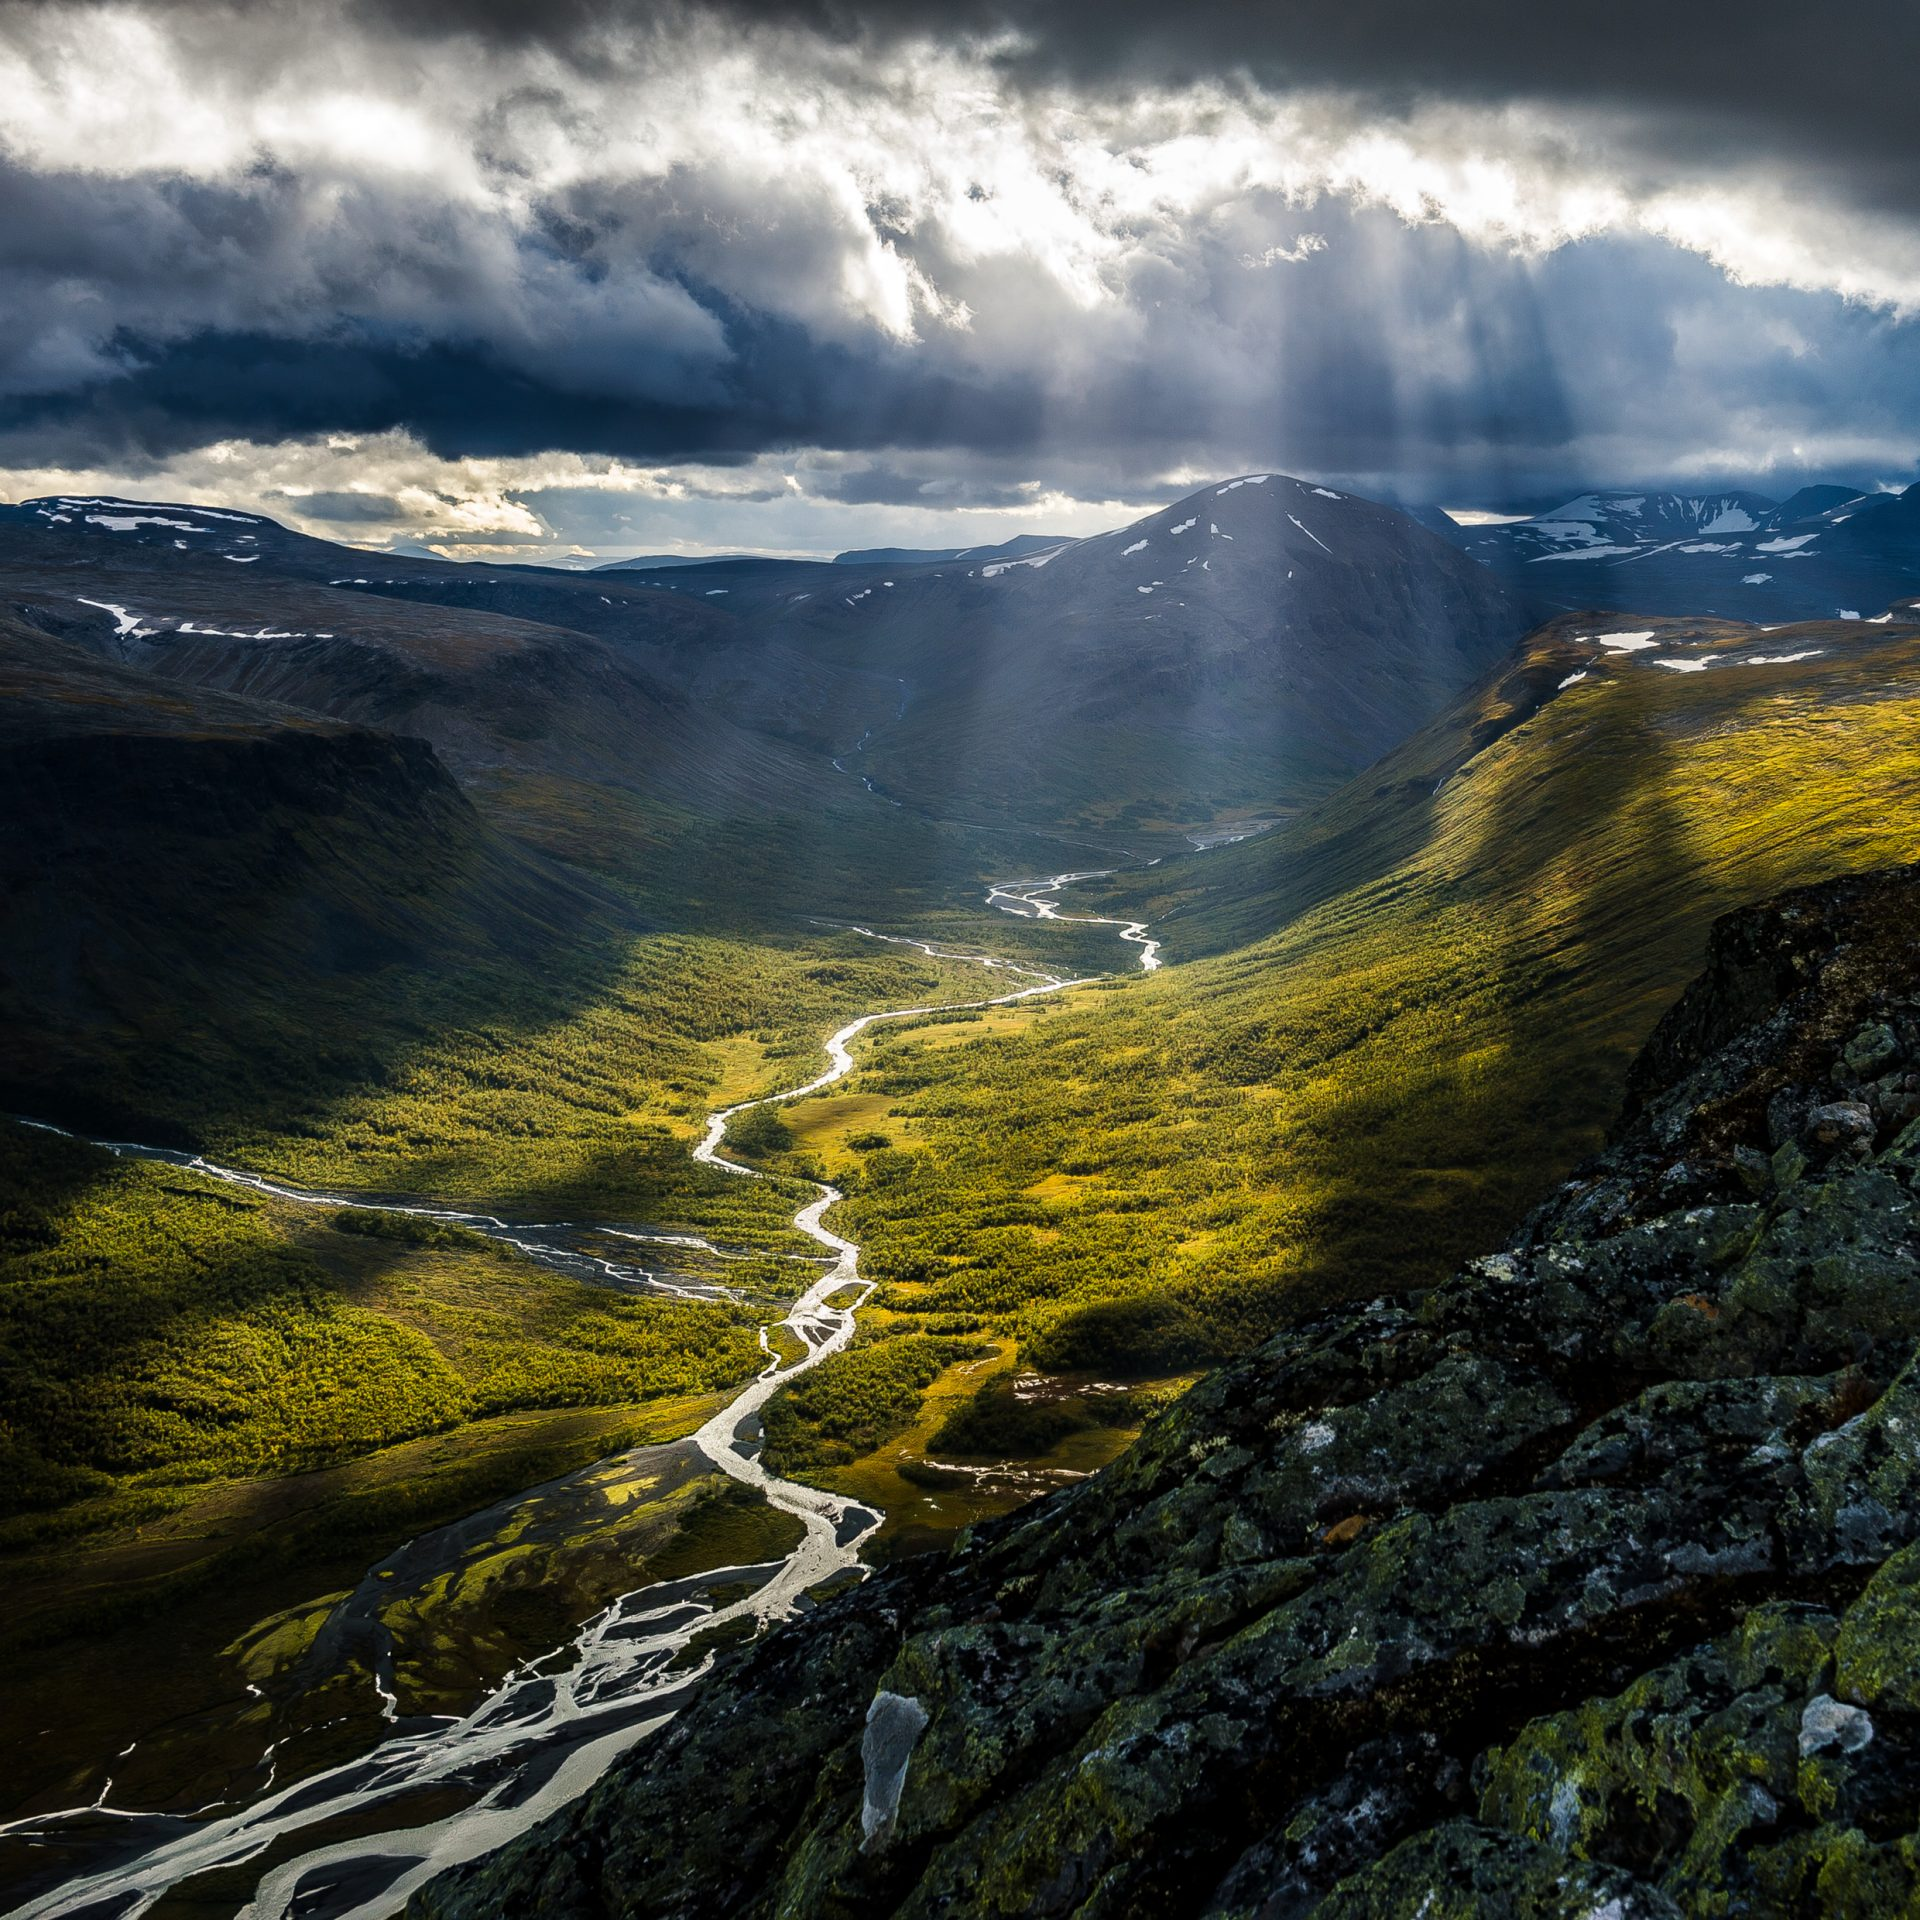 fredrik_schlyter-the_rapa_valley_in_sarek_national_park-5969